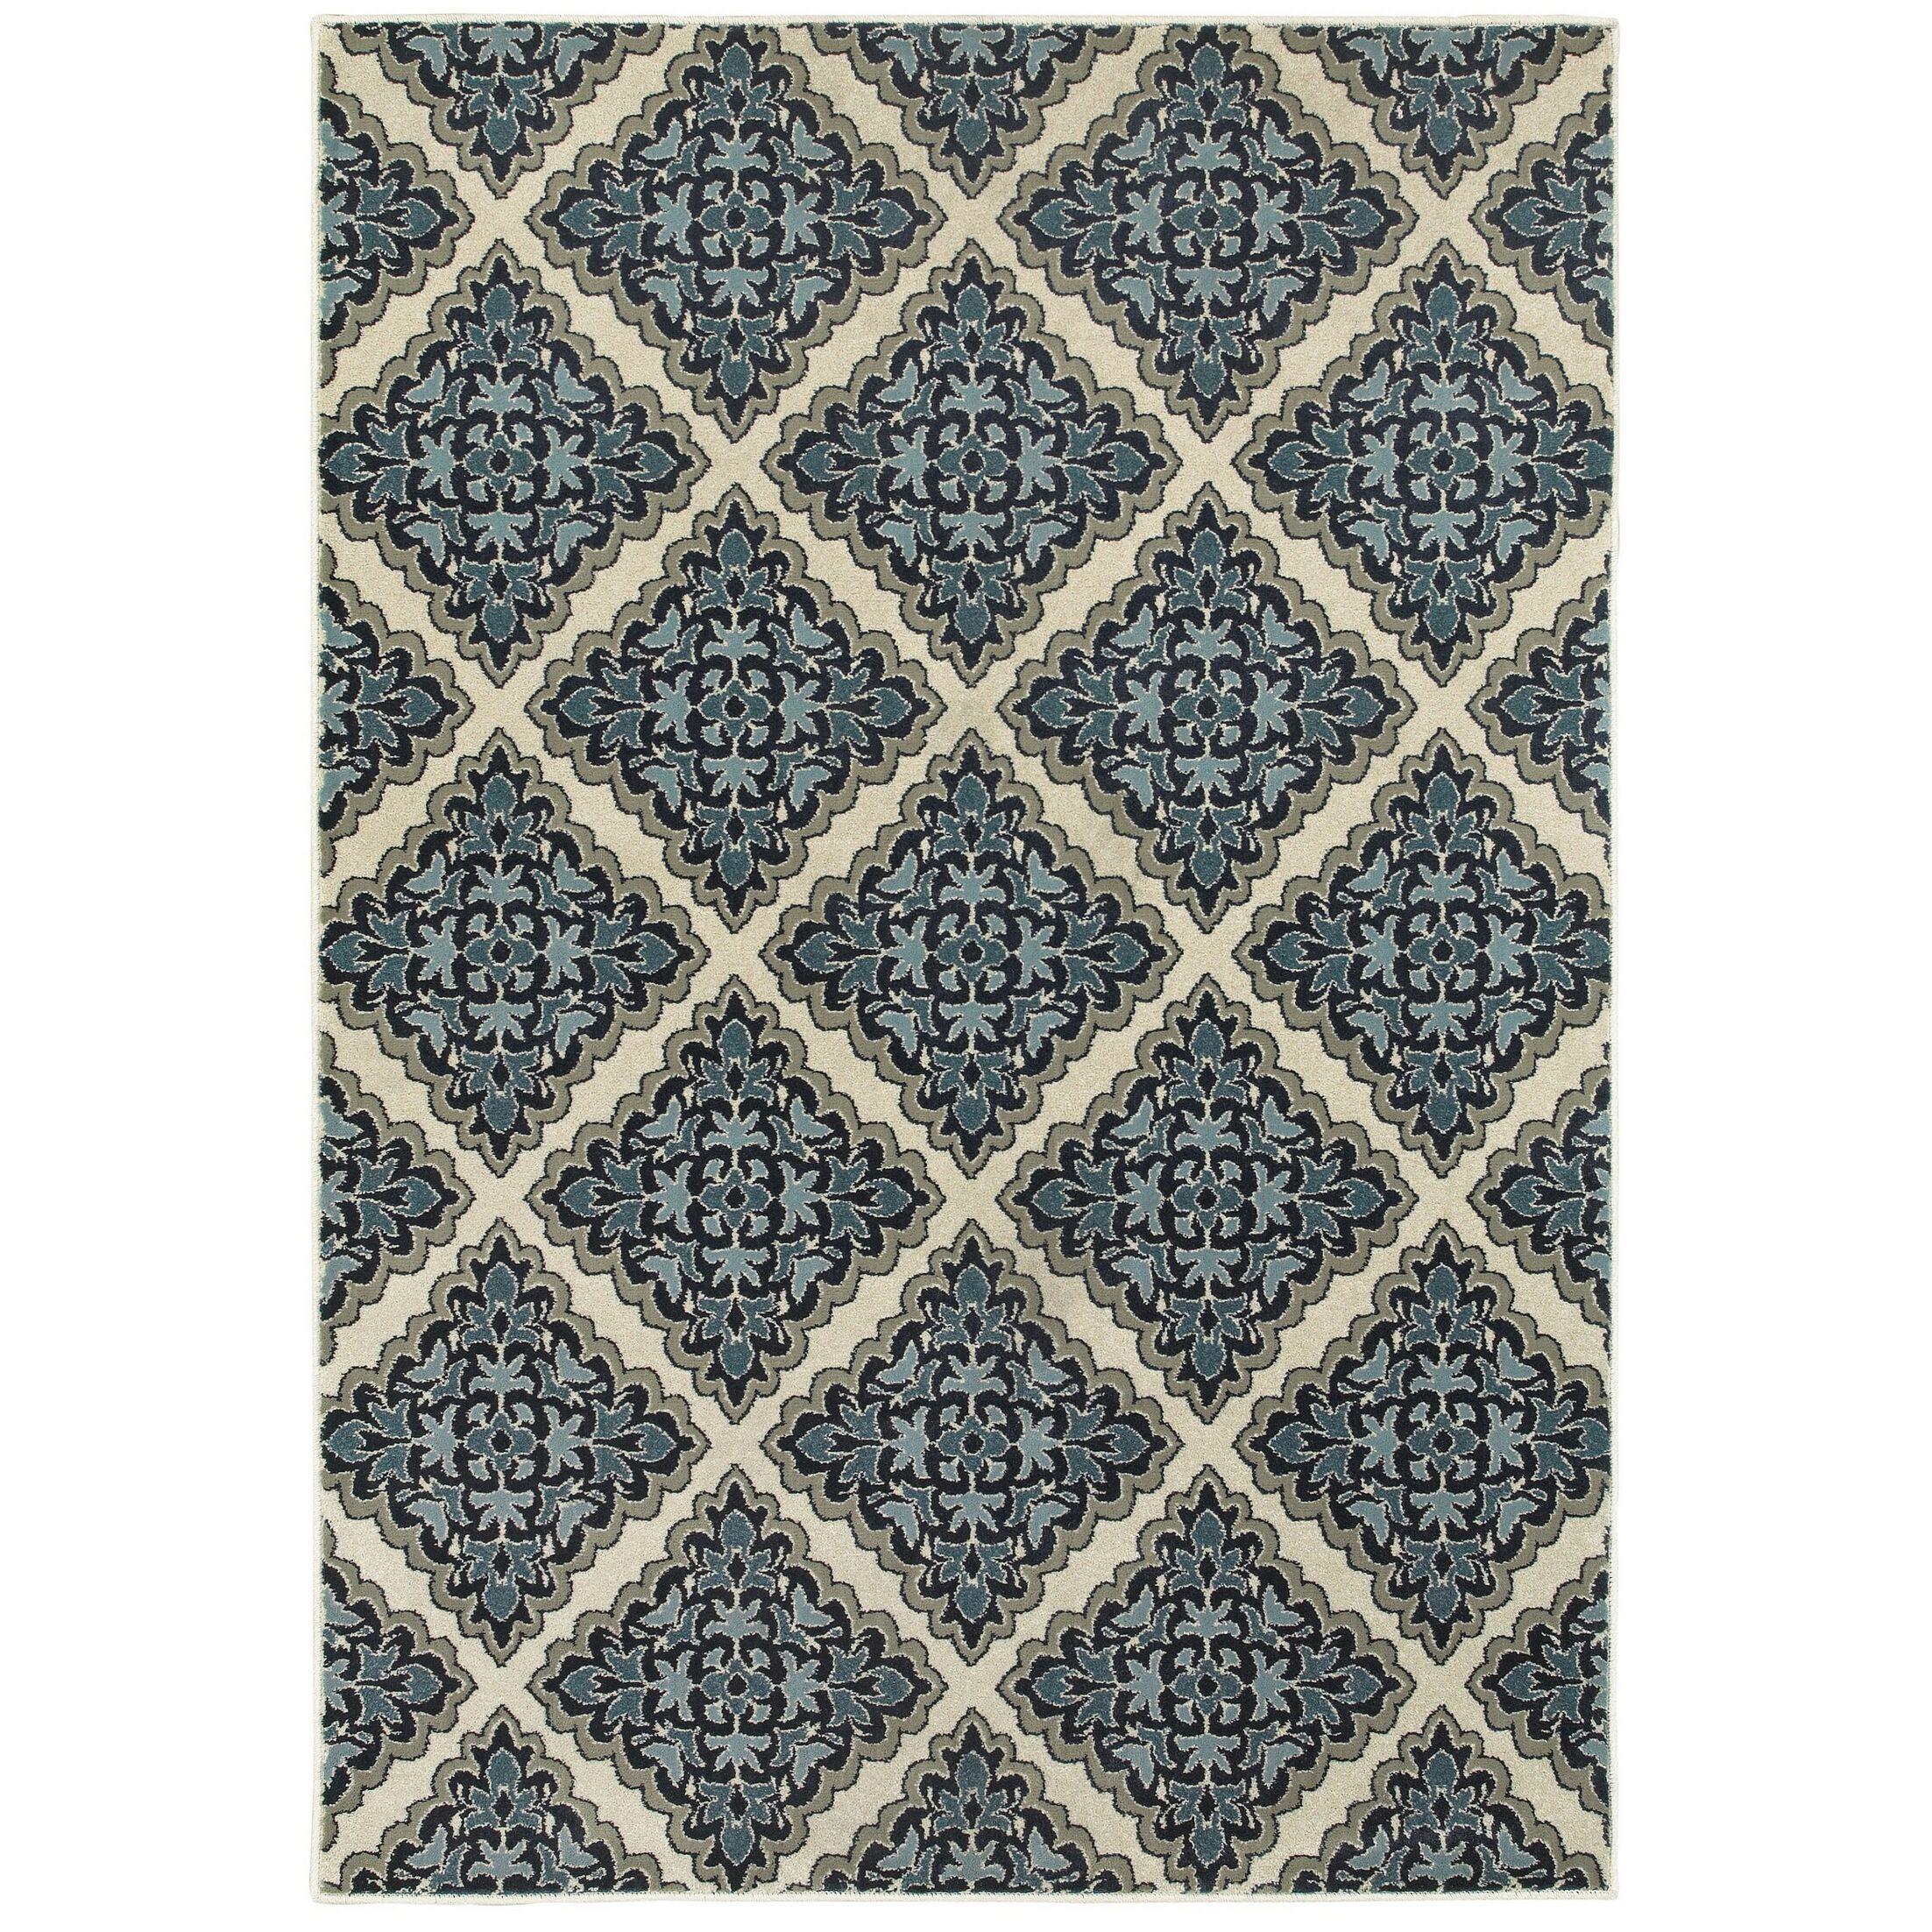 Boykins Ivory/Blue Area Rug Rug Size: Rectangle 3'10